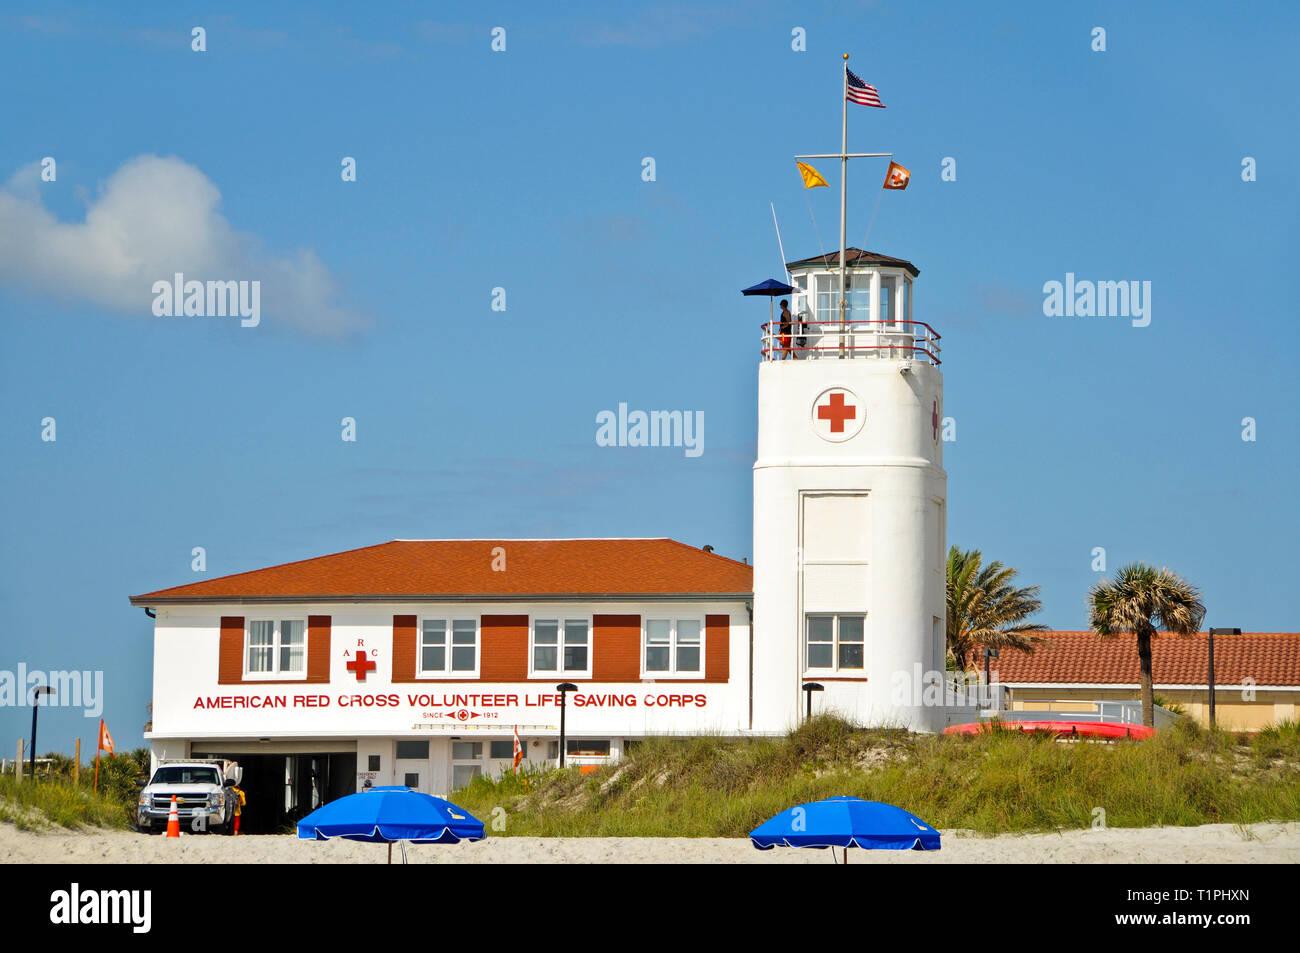 Jacksonville Beach, Florida / USA - April 17, 2012: American Red Cross Volunteer Life Saving Corps located at Jacksonville Beach, Florida - Stock Image